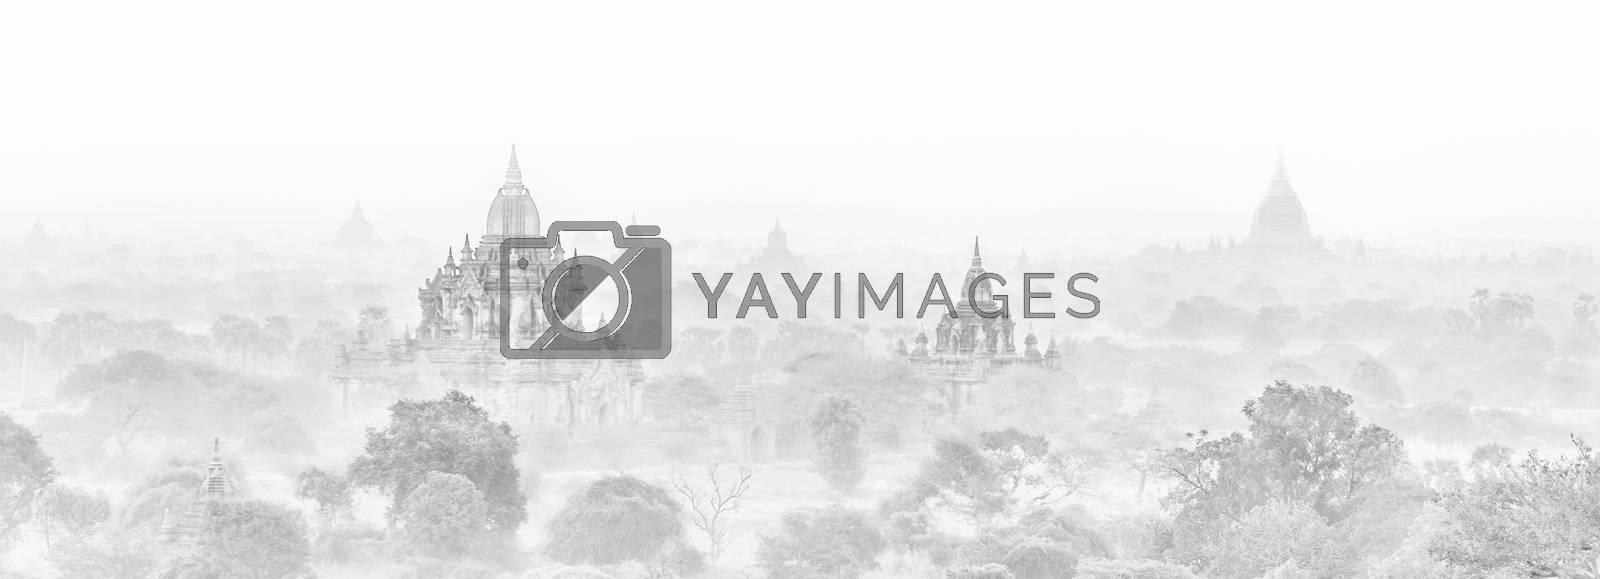 Royalty free image of Temples of Bagan, Burma, Myanmar, Asia. by kasto